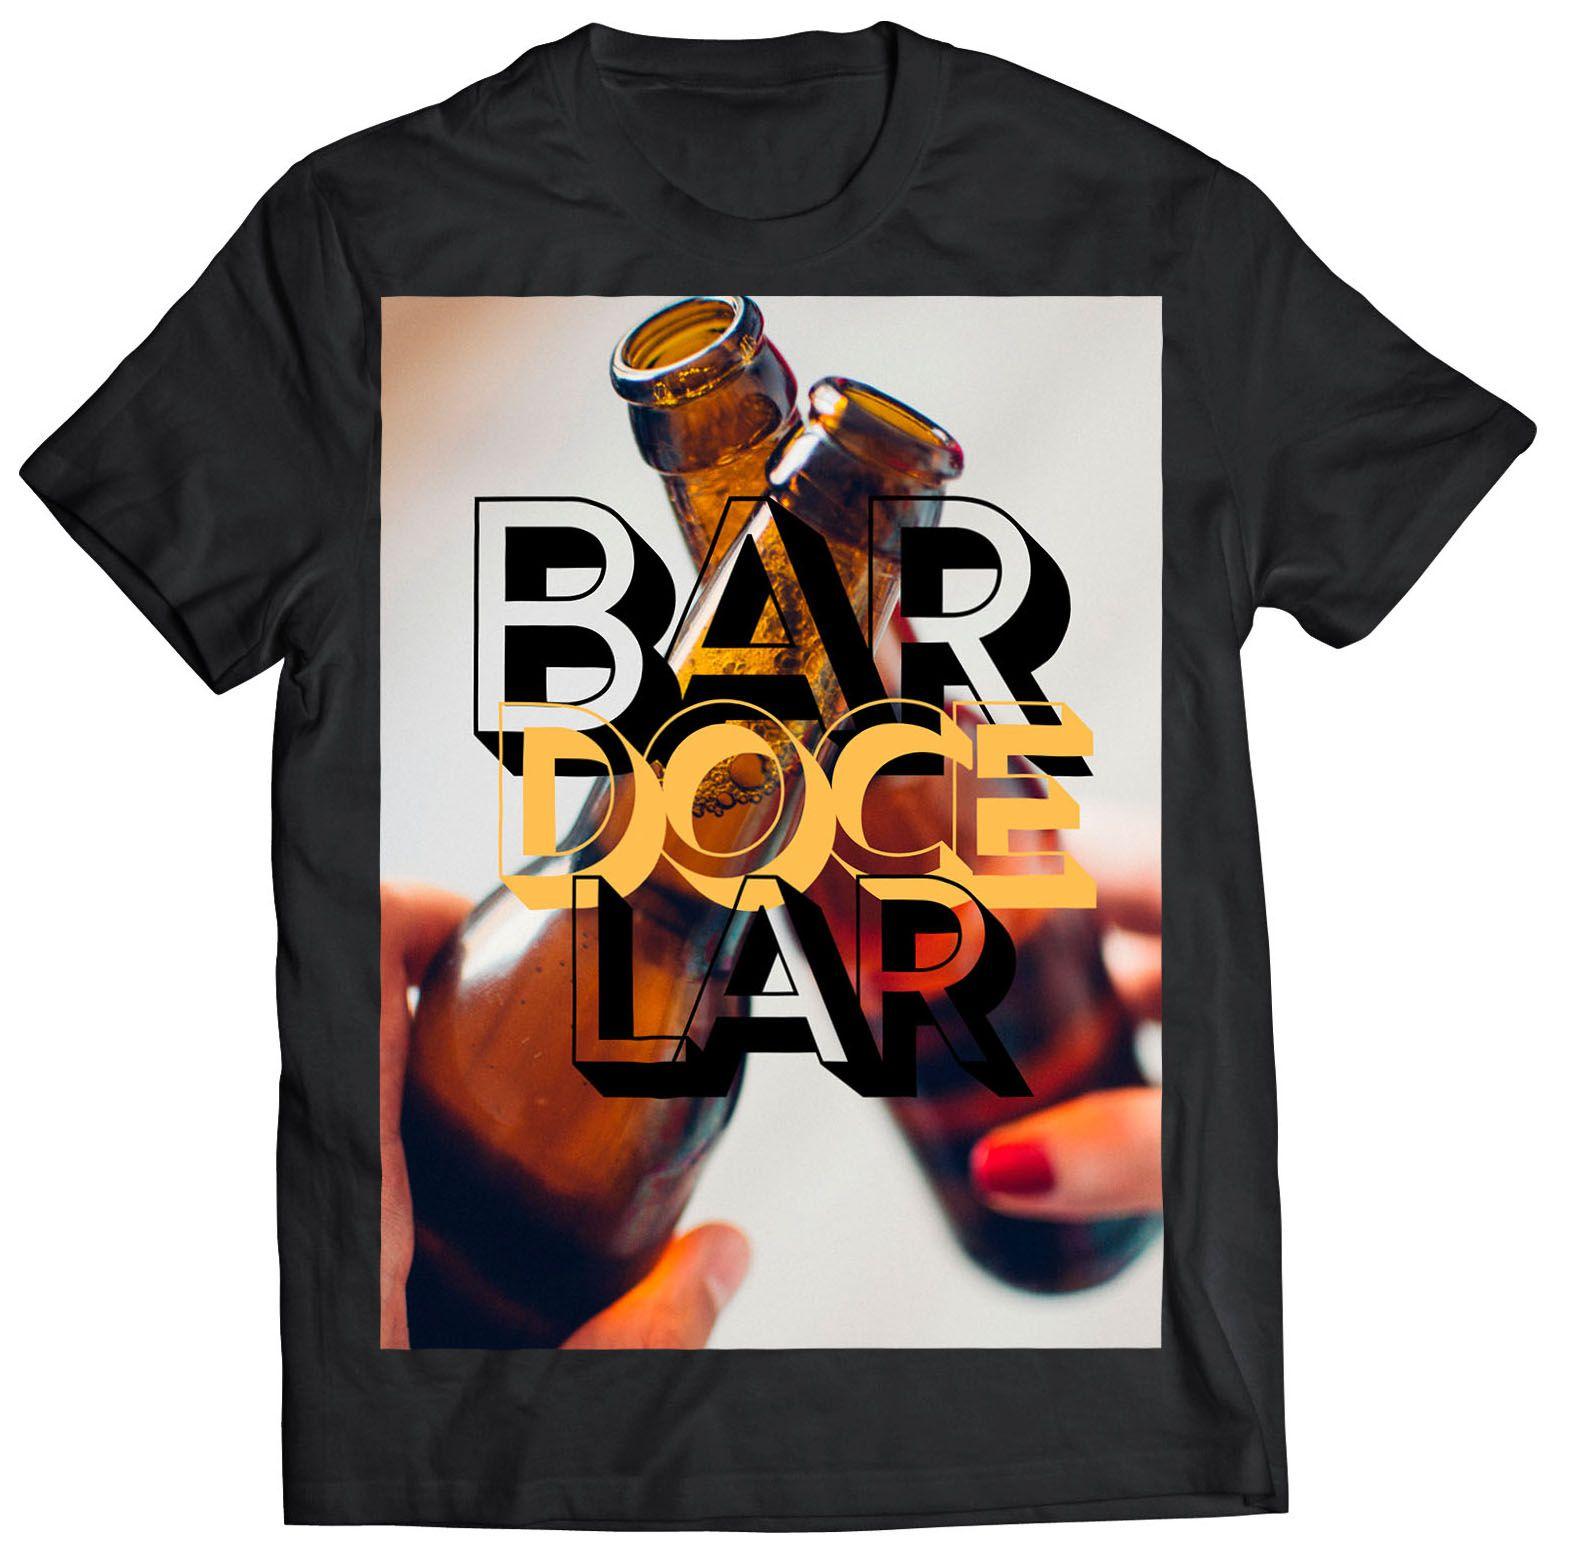 Camiseta - BAR DOCE LAR - Maculino